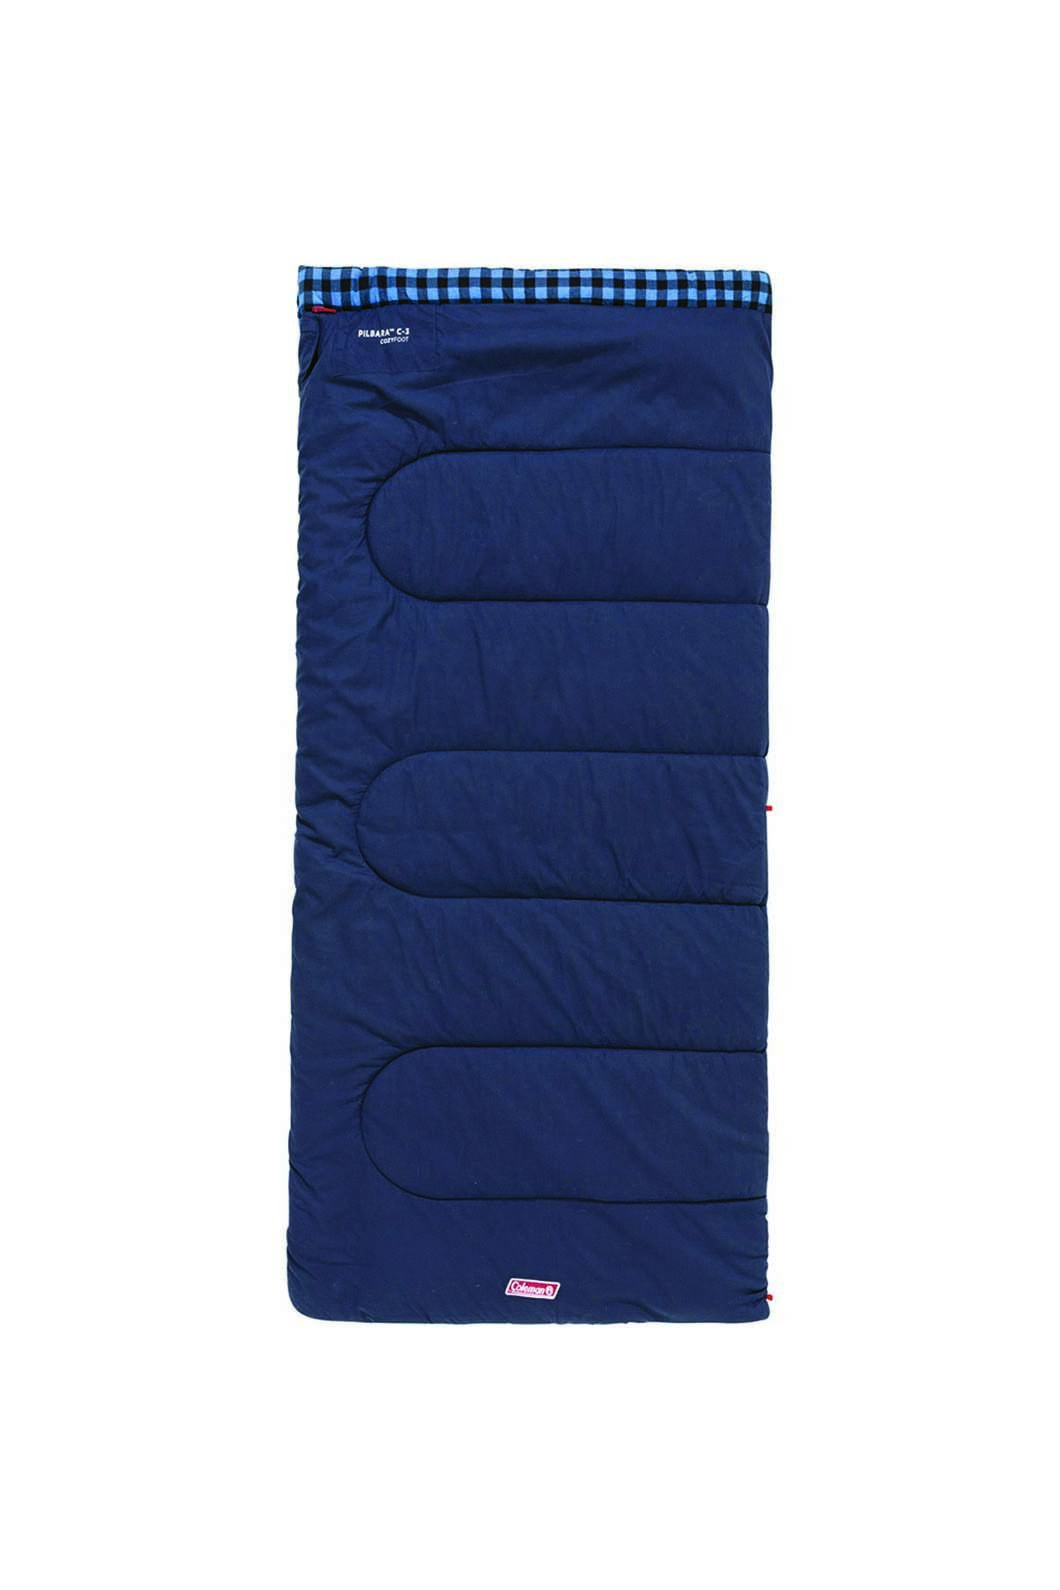 Coleman Pilbara Tall Sleeping Bag -5, None, hi-res